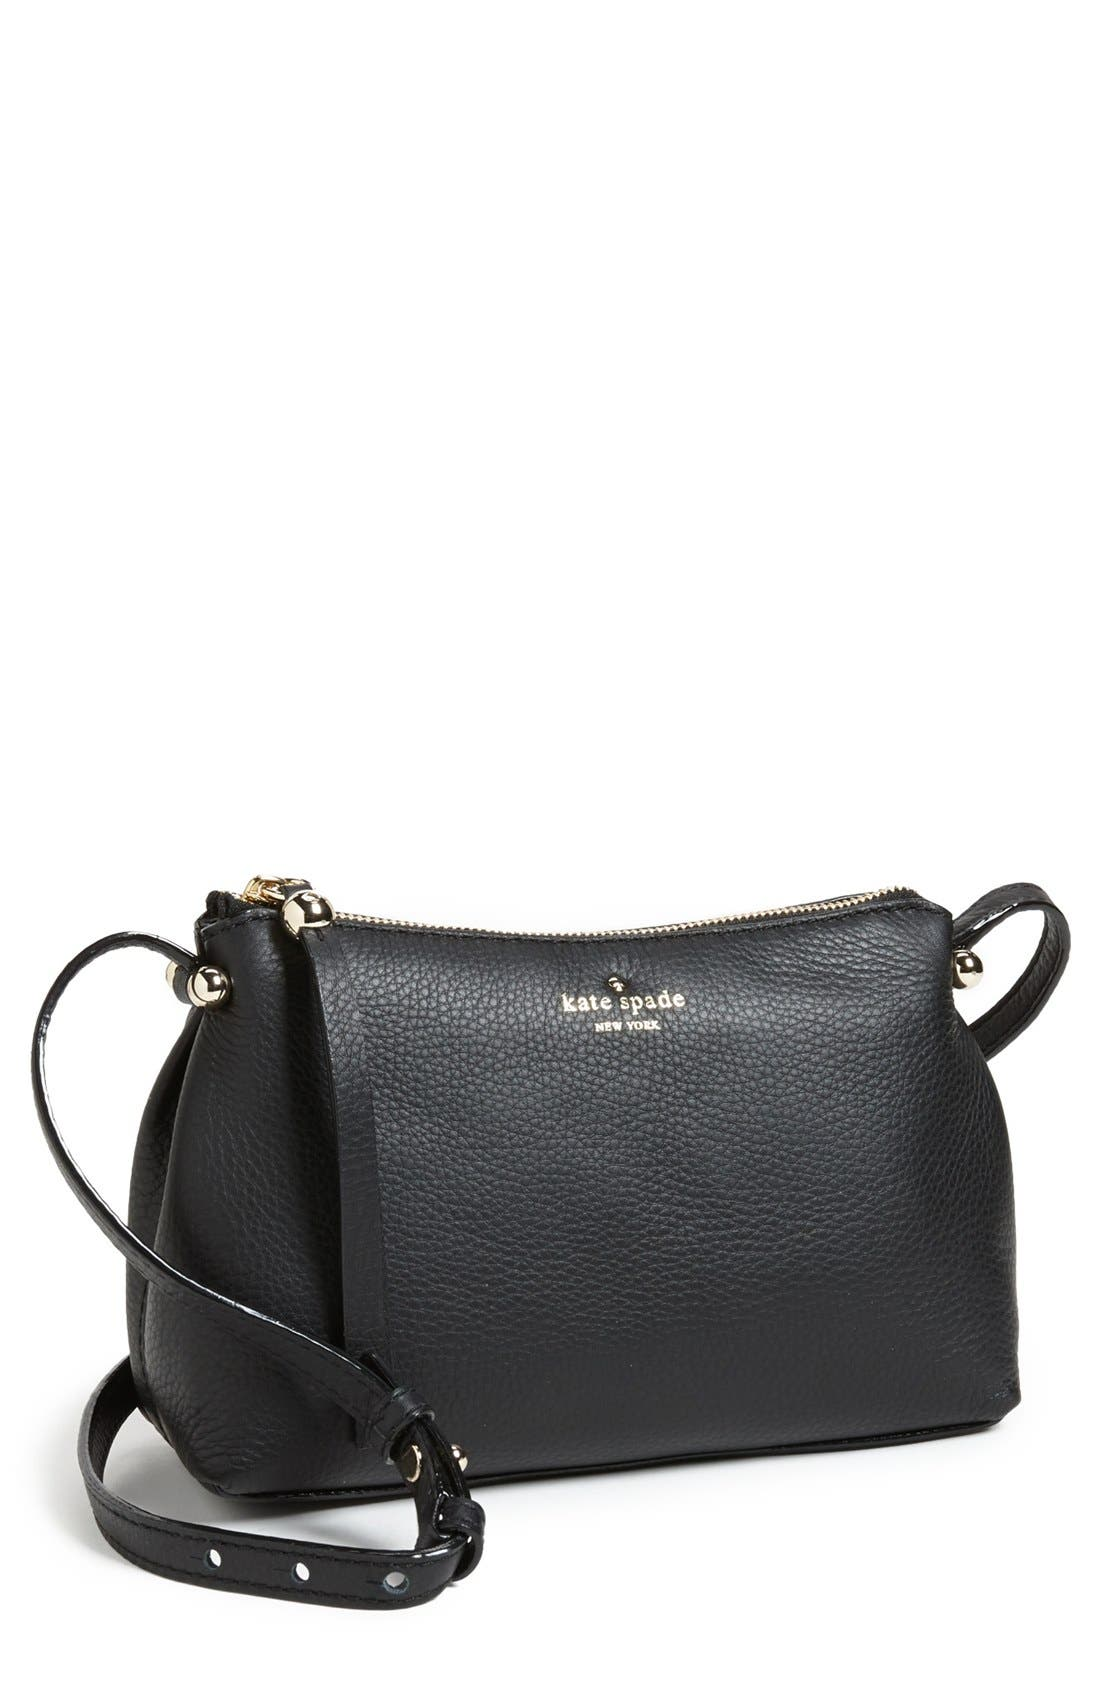 Alternate Image 1 Selected - kate spade new york 'claudie' leather crossbody bag